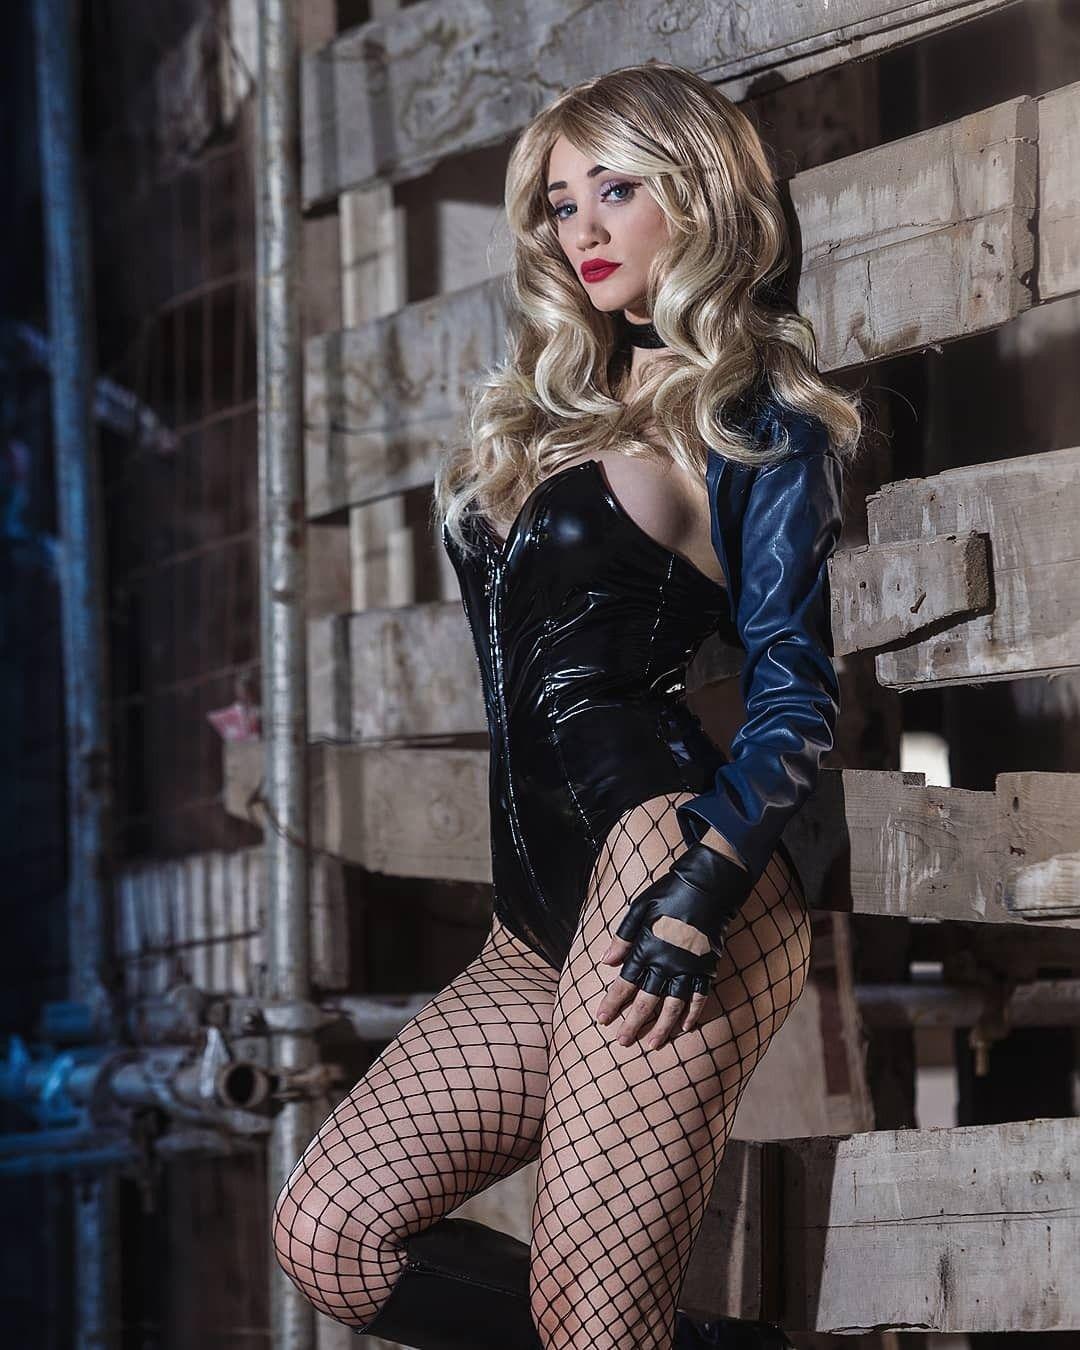 DC - Black Canary by MilliganVick.deviantart.com on